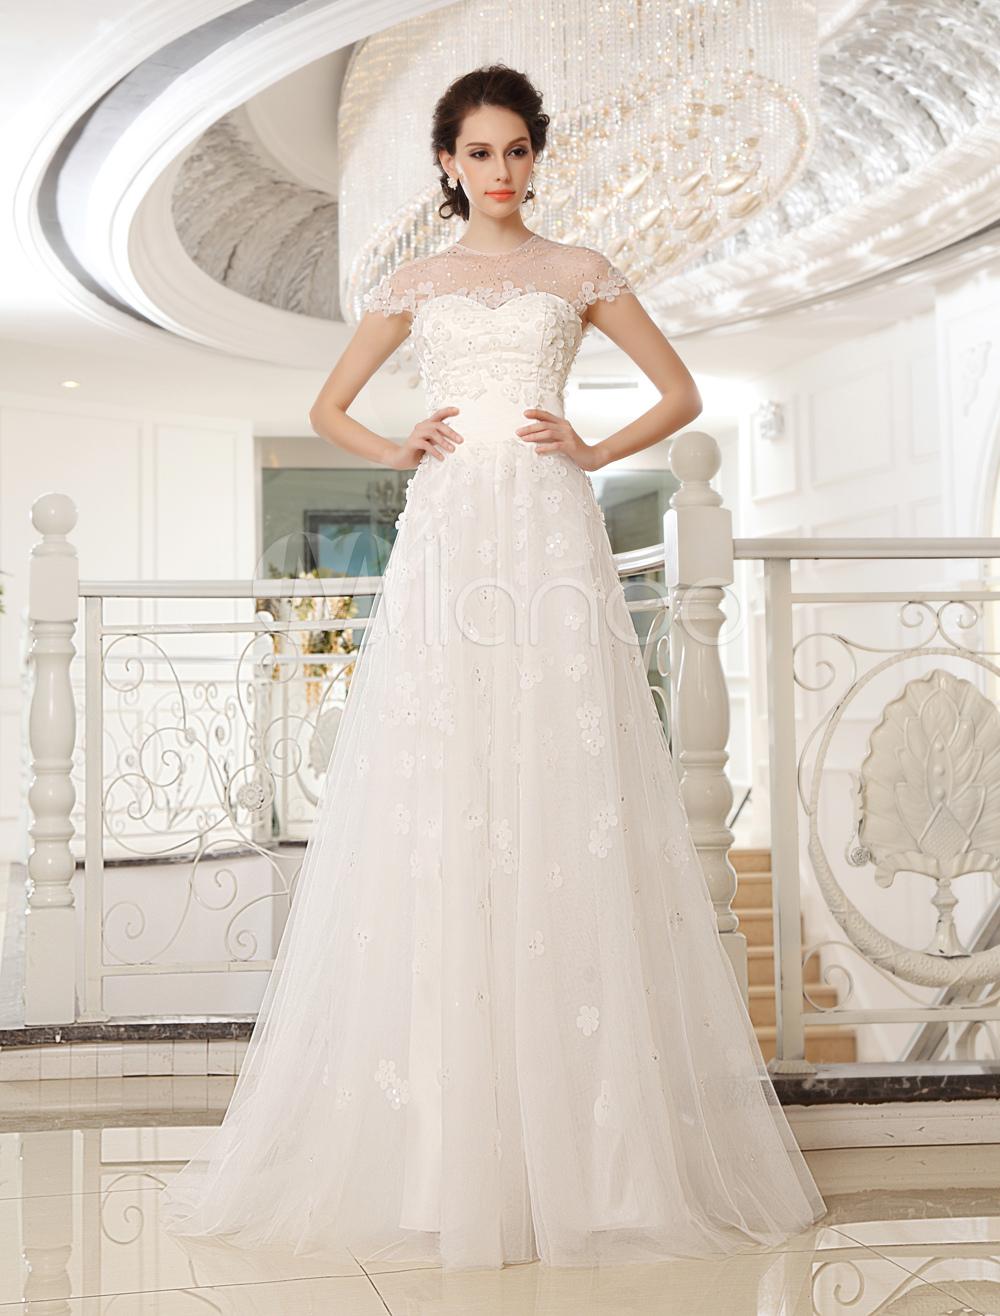 Sweep Ivory Jewel Neck A-line Strapless Sequin Wedding Dress For Bride Milanoo